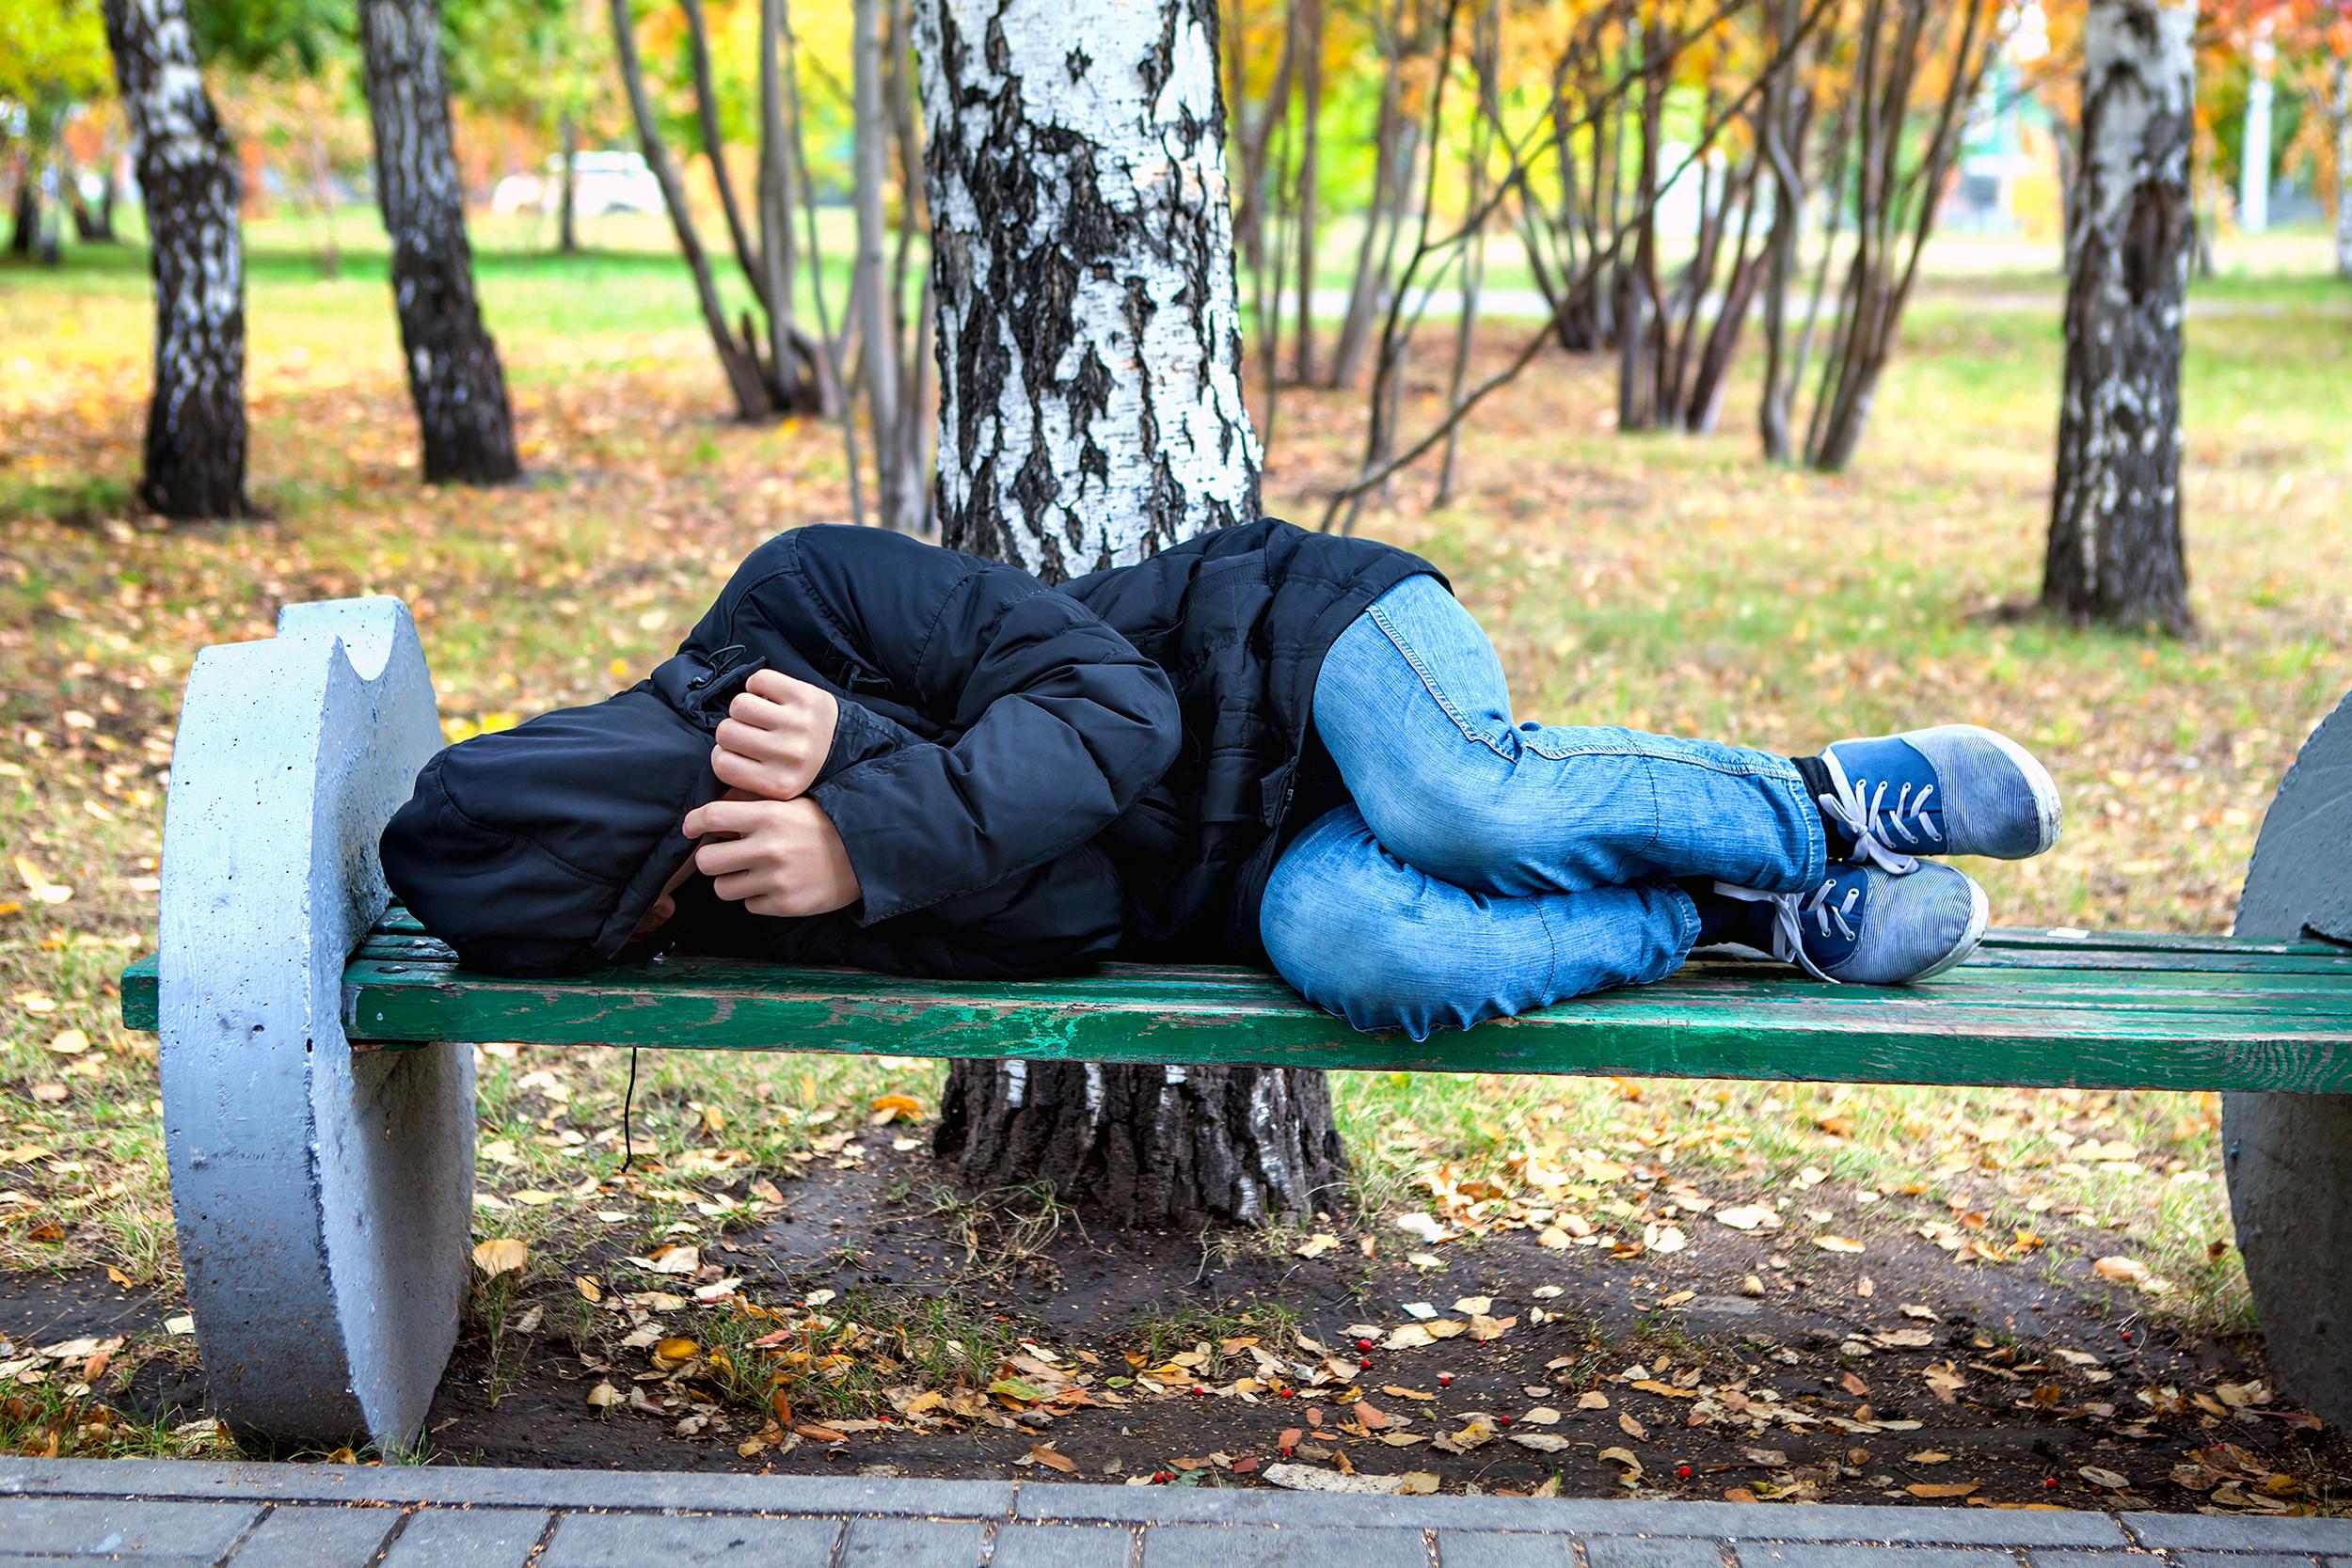 Homeless Beaverton youth sleeping on park bench helped with food over BeavertonHighbreaks